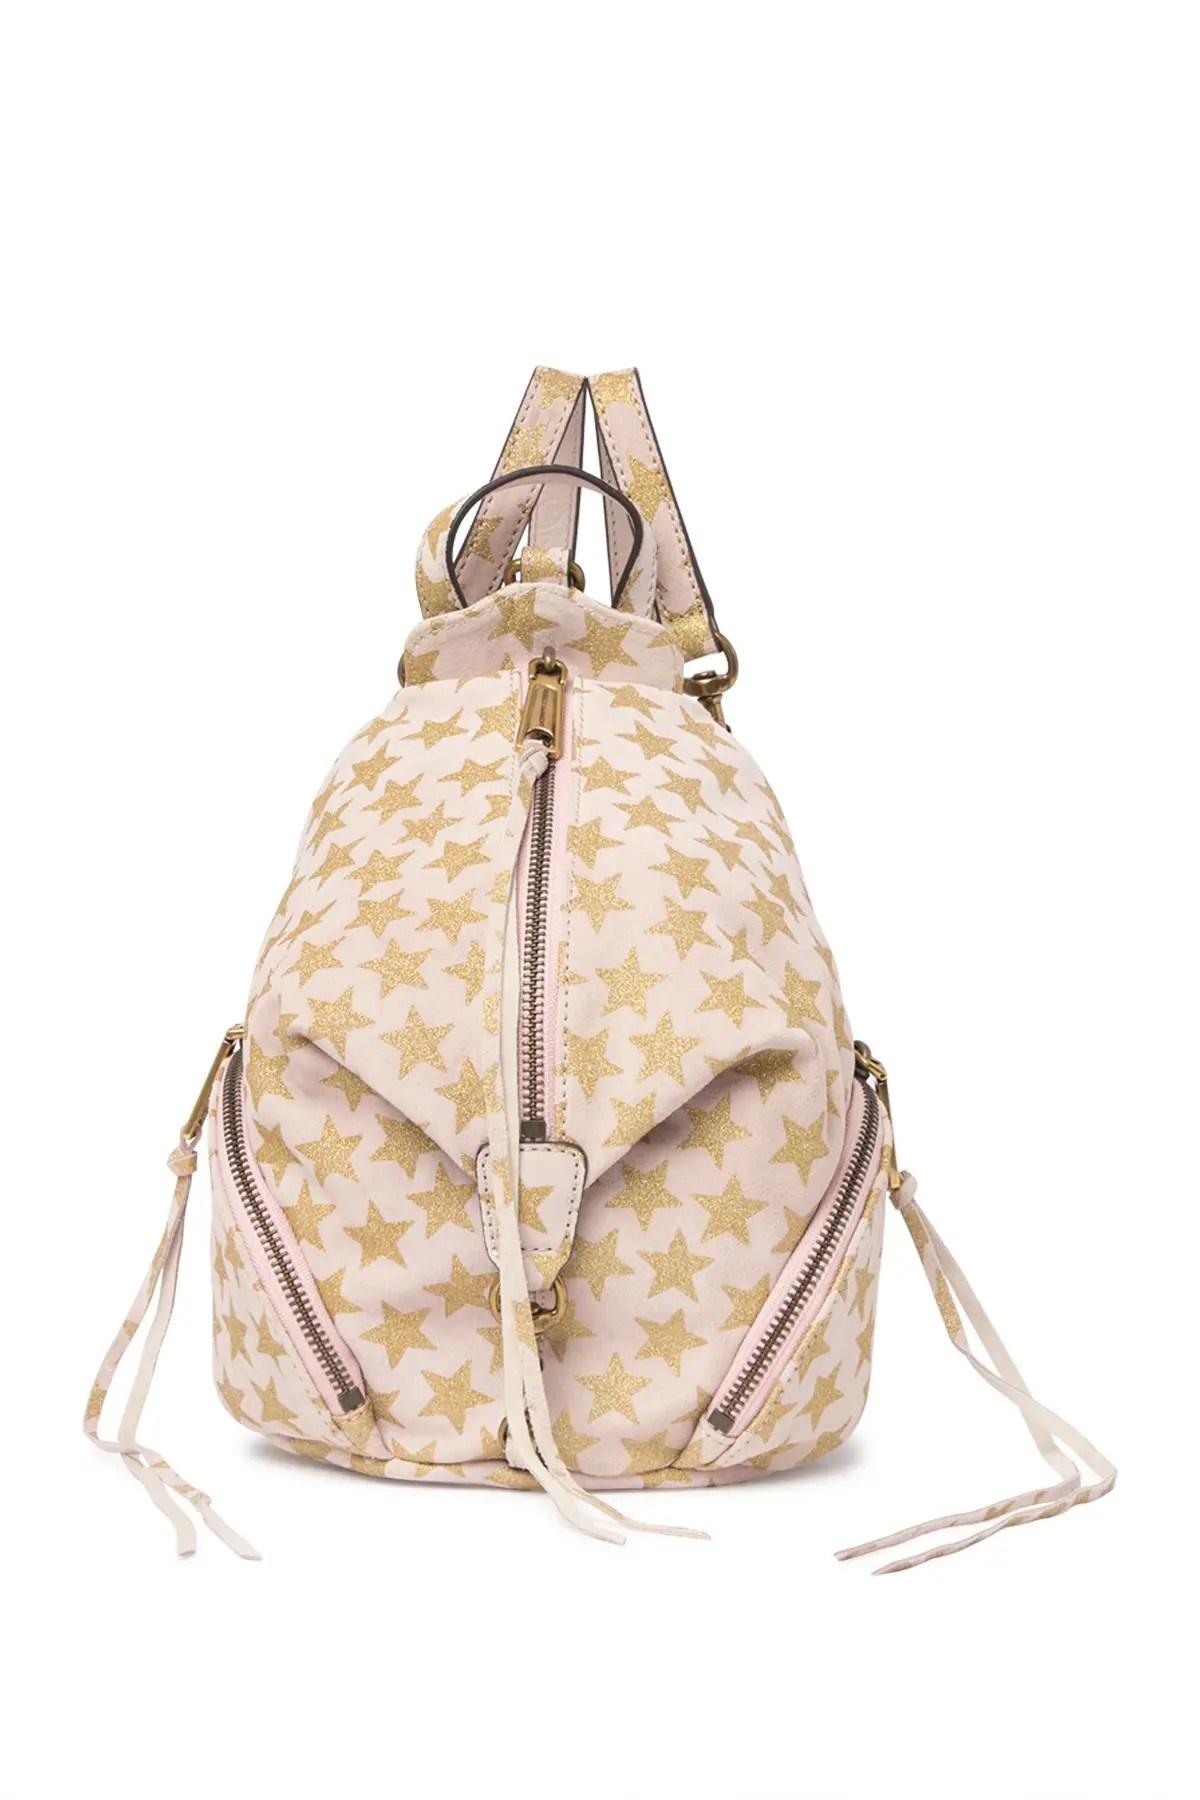 rebecca minkoff julian printed leather convertible mini backpack nordstrom rack